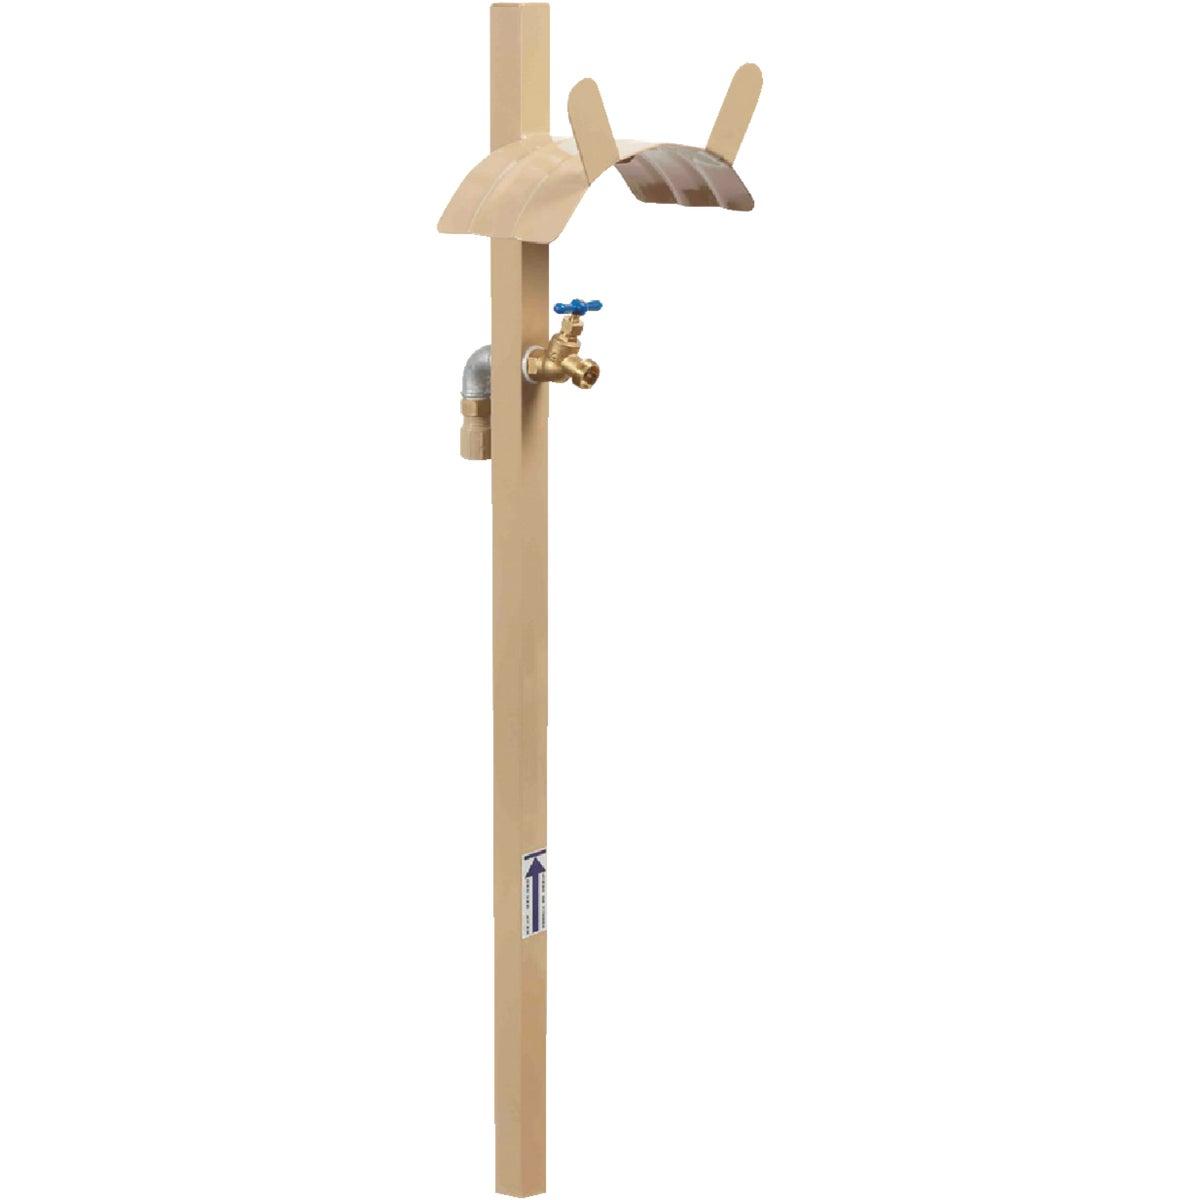 Yard Butler HCF-3 Free-Standing Garden Hose Hanger with Faucet